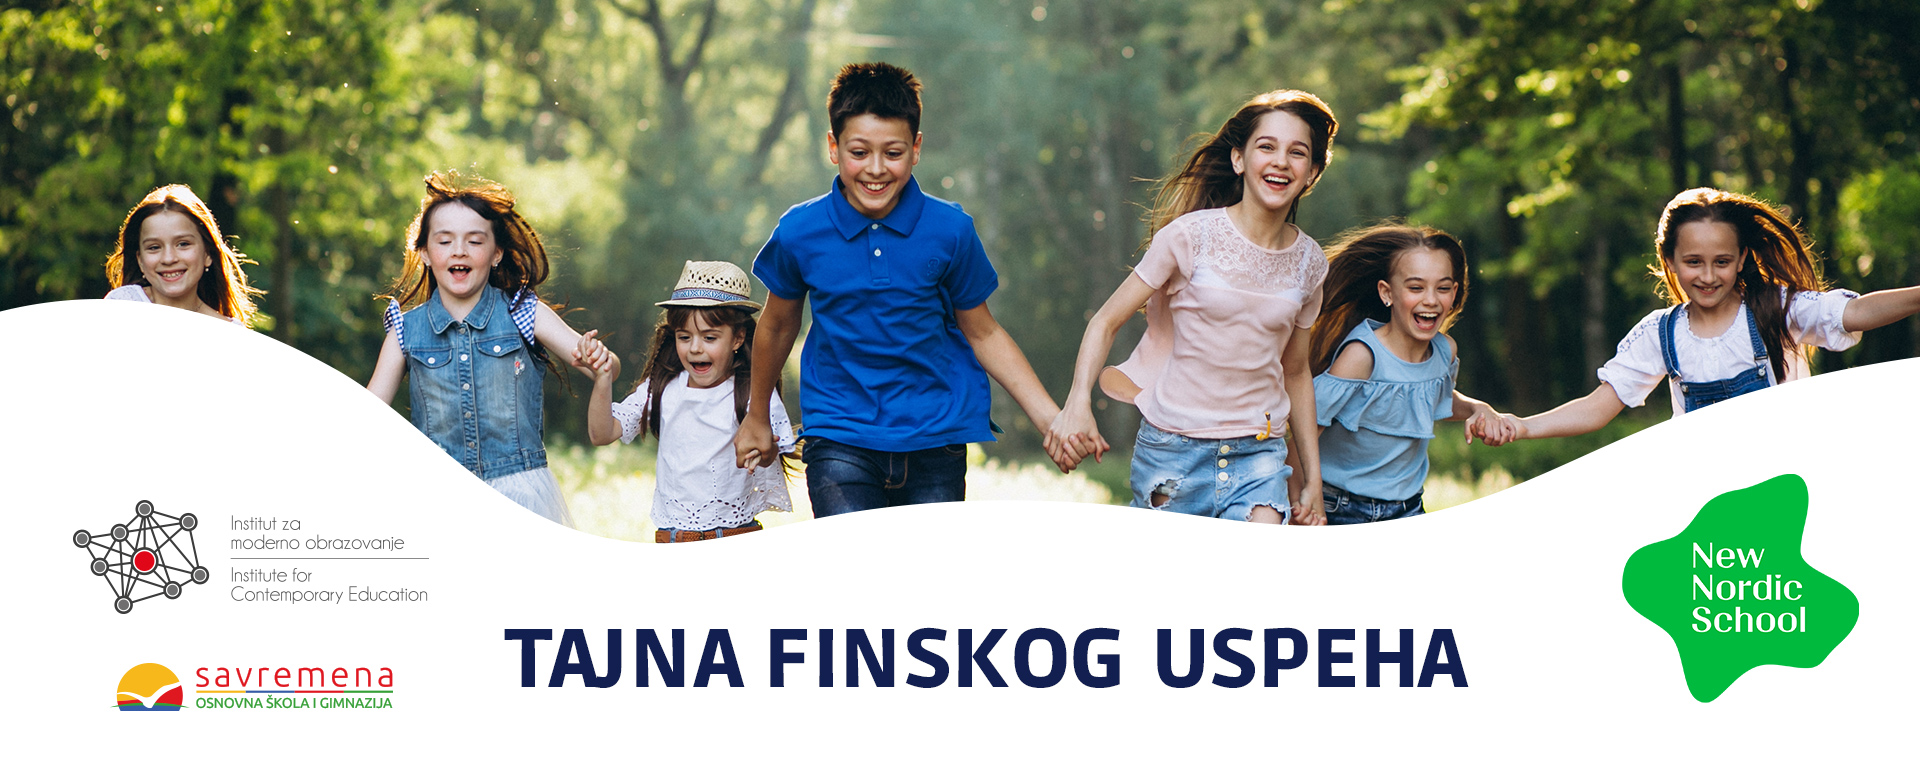 Tajna finskog uspeha